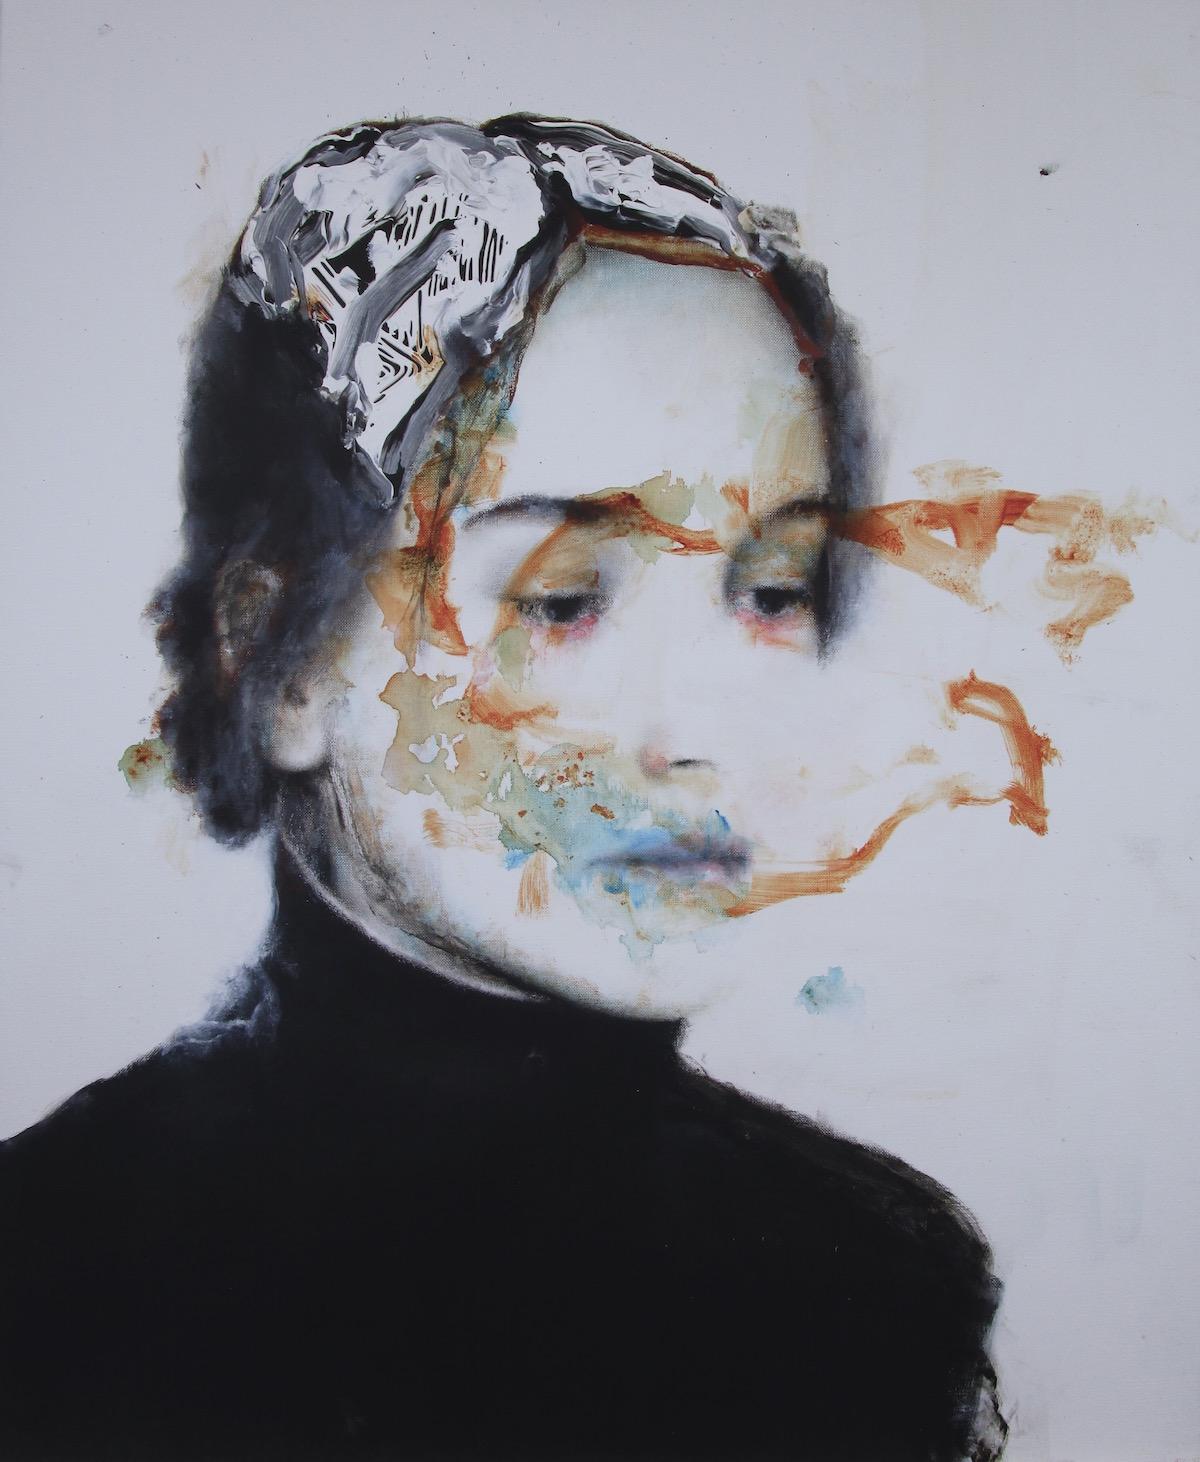 Antoine Cordet canvas toile peinture painting portrait art artist artiste peintre acrylic The three arms dialect